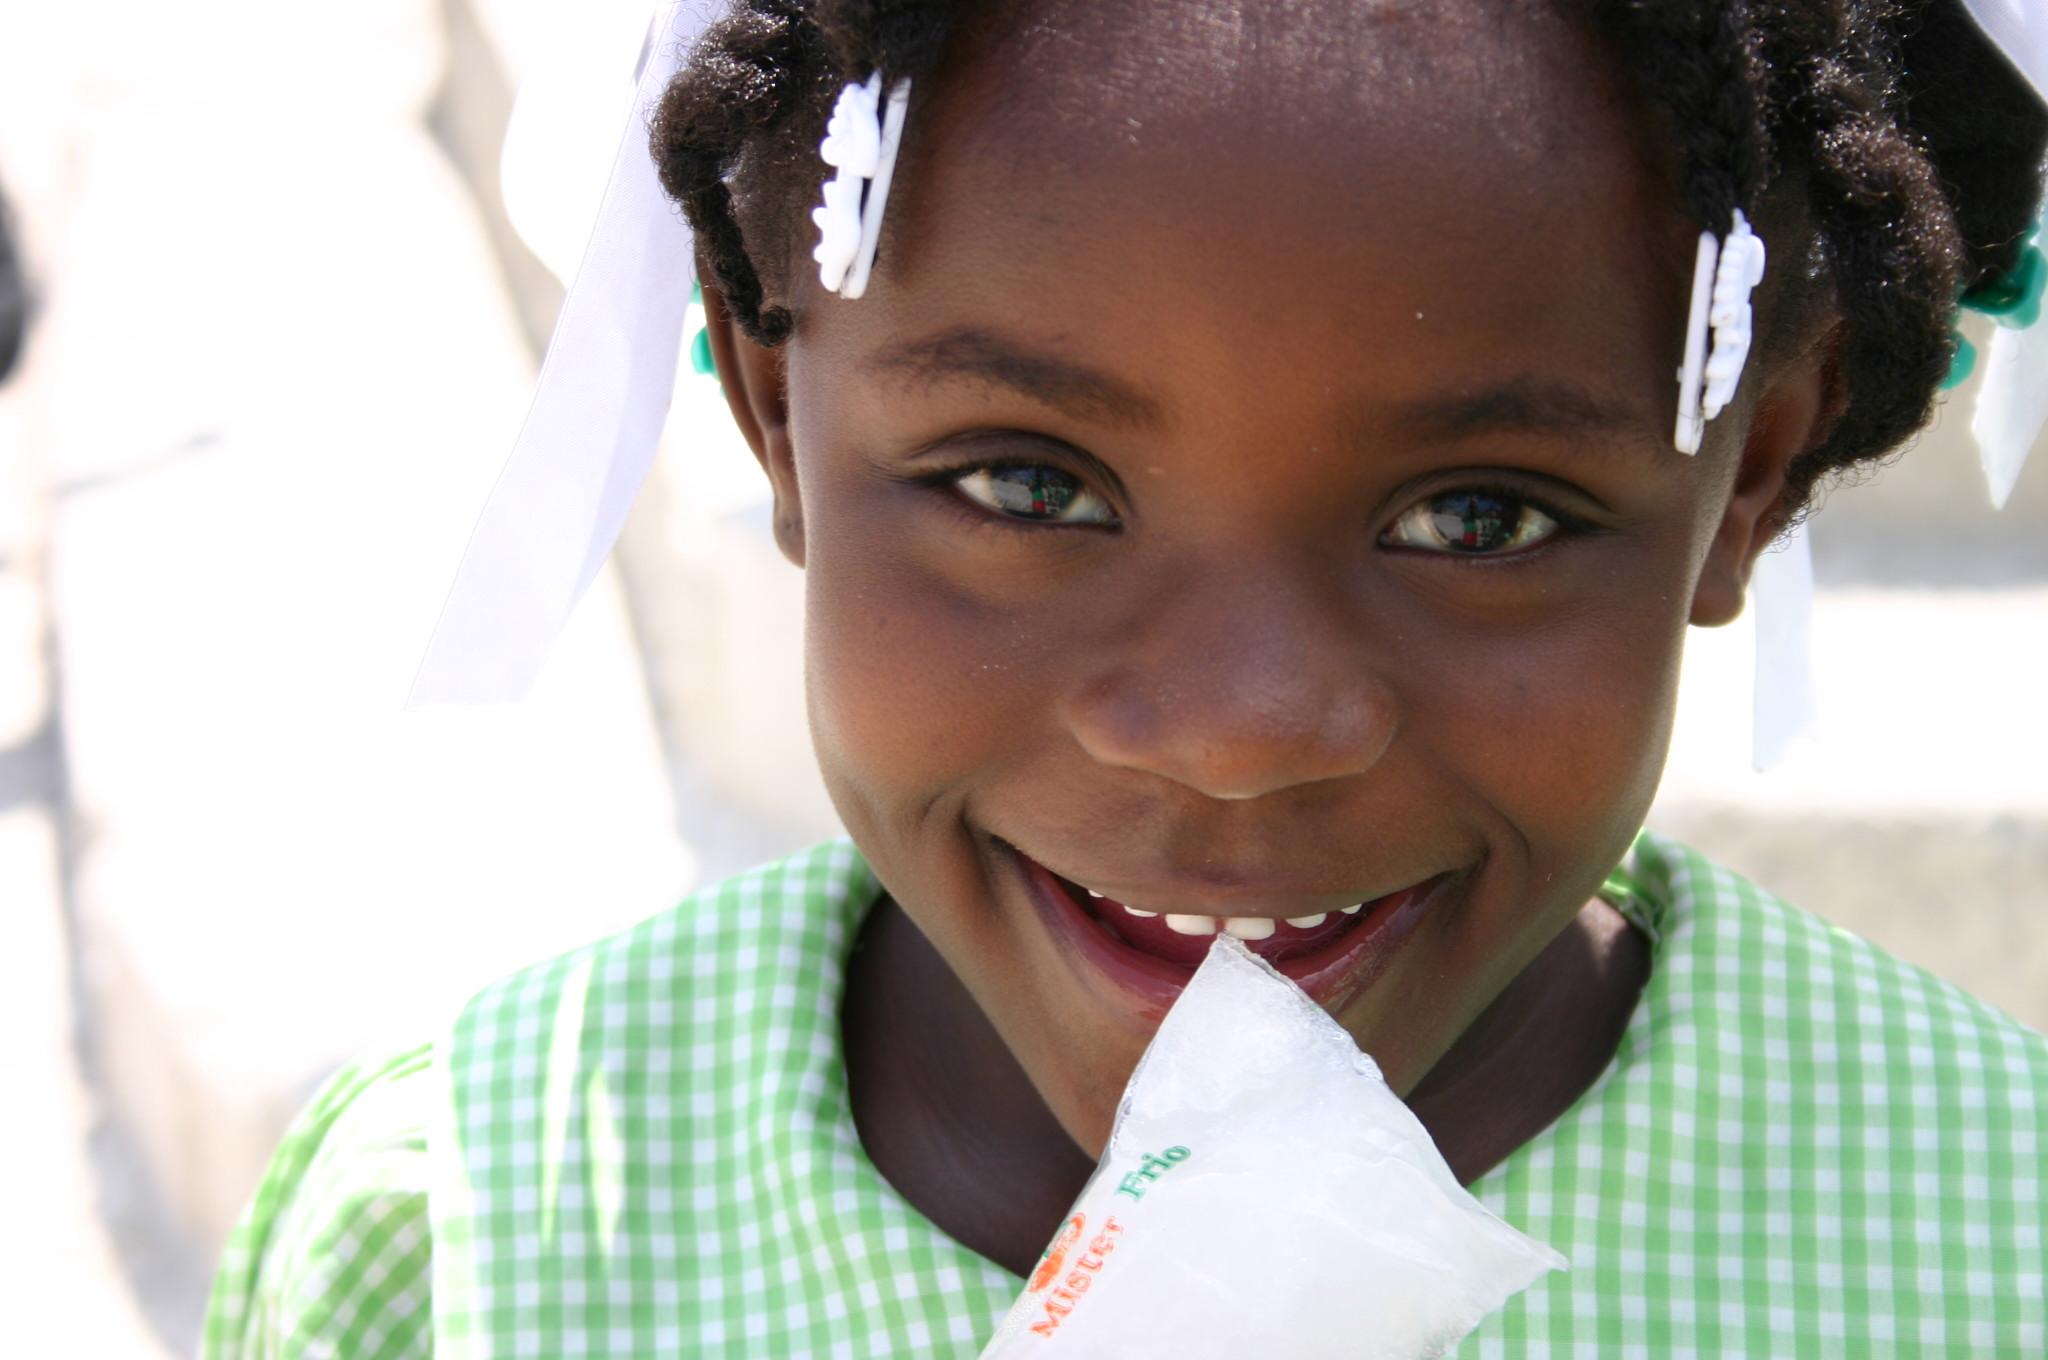 April 2007: Haitian Orphanage